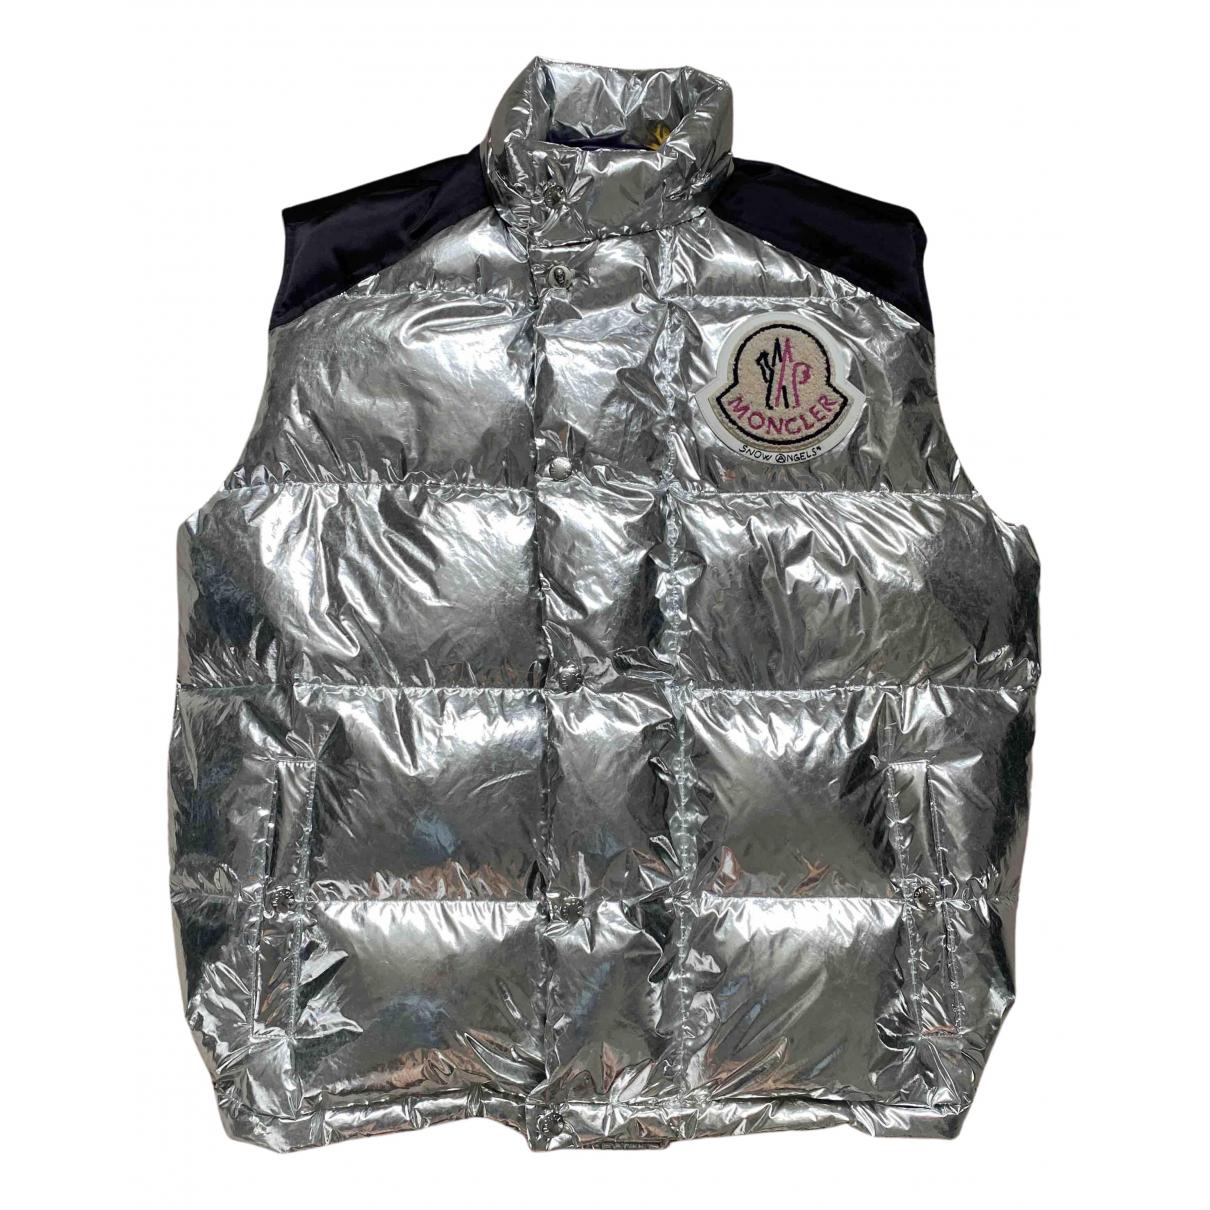 Moncler Genius Moncler n°8 Palm Angels Silver jacket  for Men M International